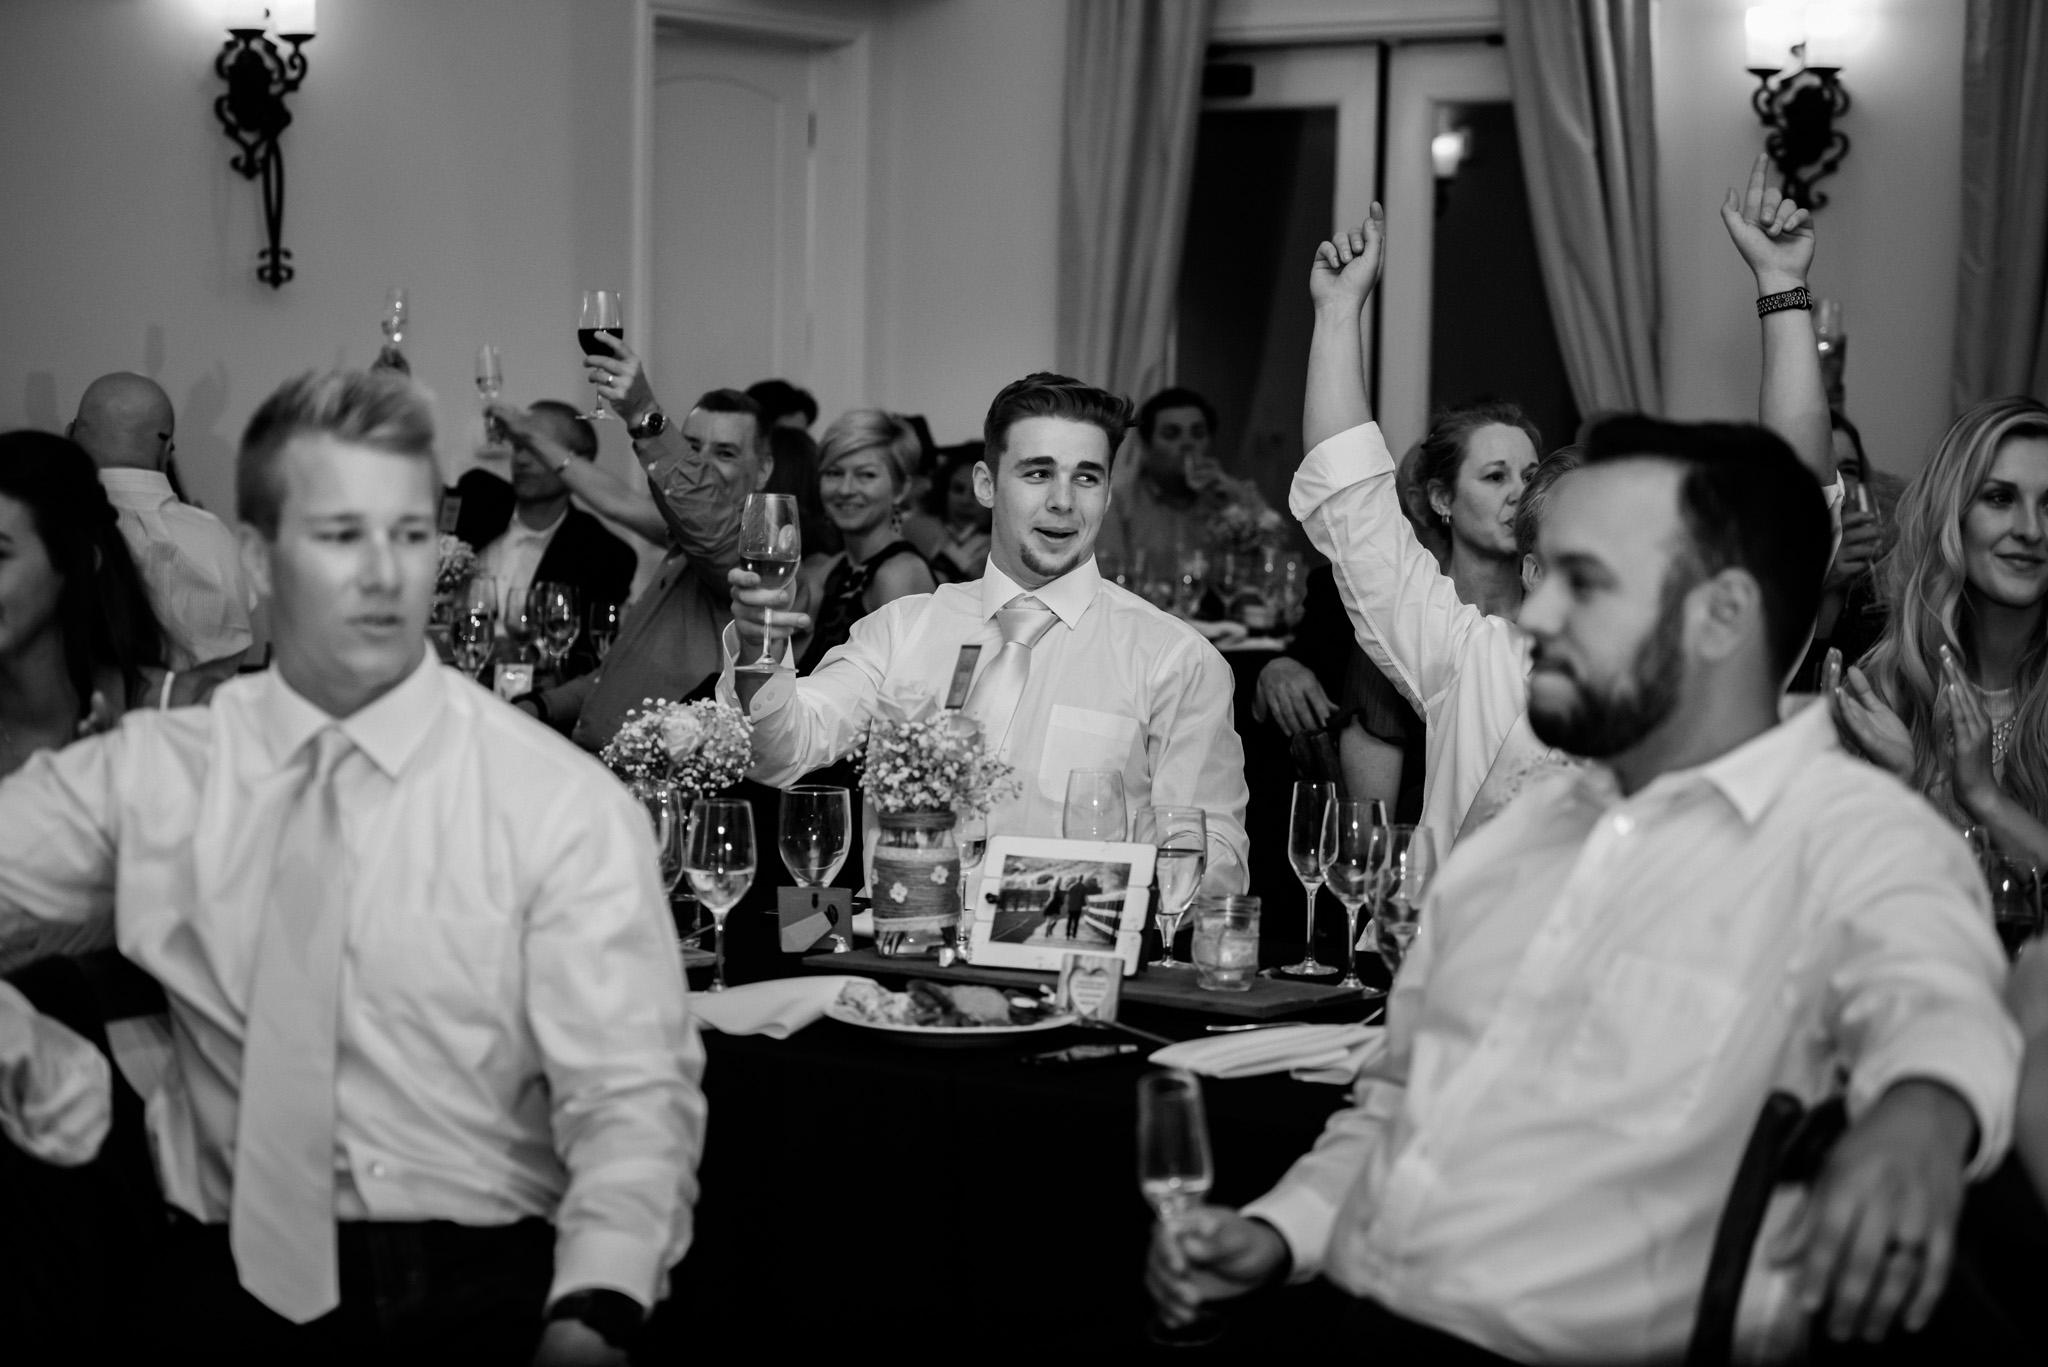 Avensole-Winery-Temecula-Wedding-Josh-and-Olivia-4033.JPG